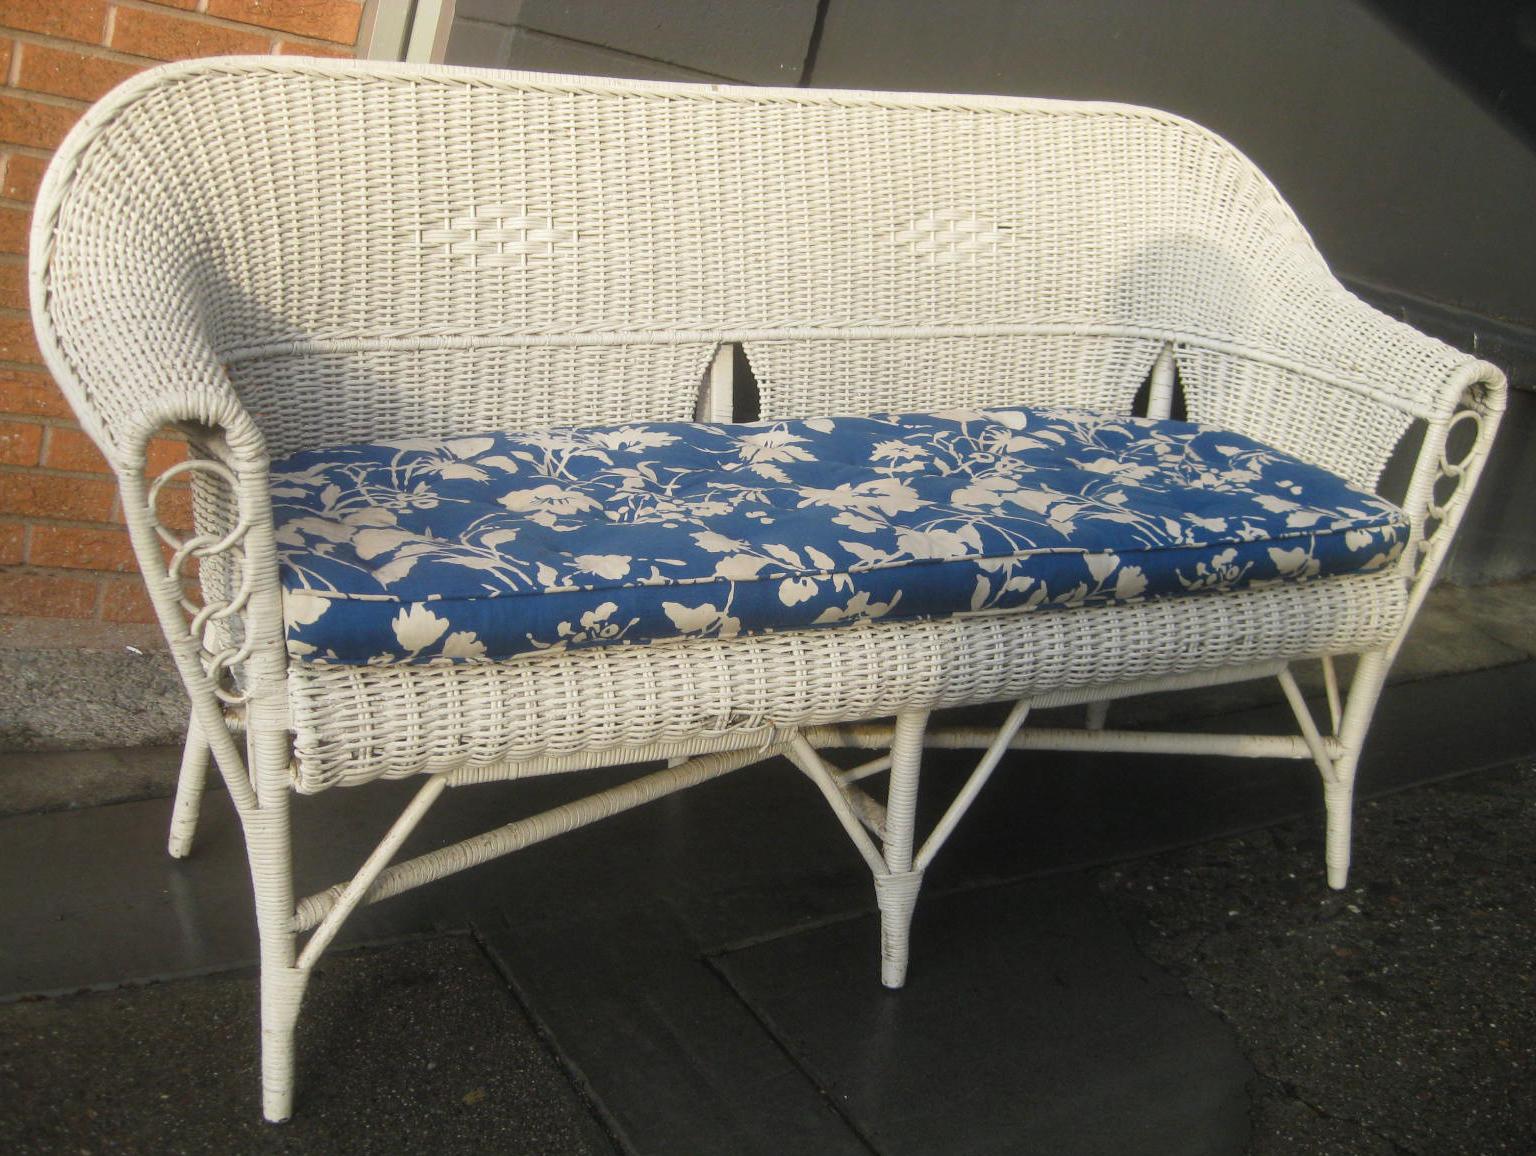 Uhuru Furniture Collectibles Sold White Wicker Sofa 50